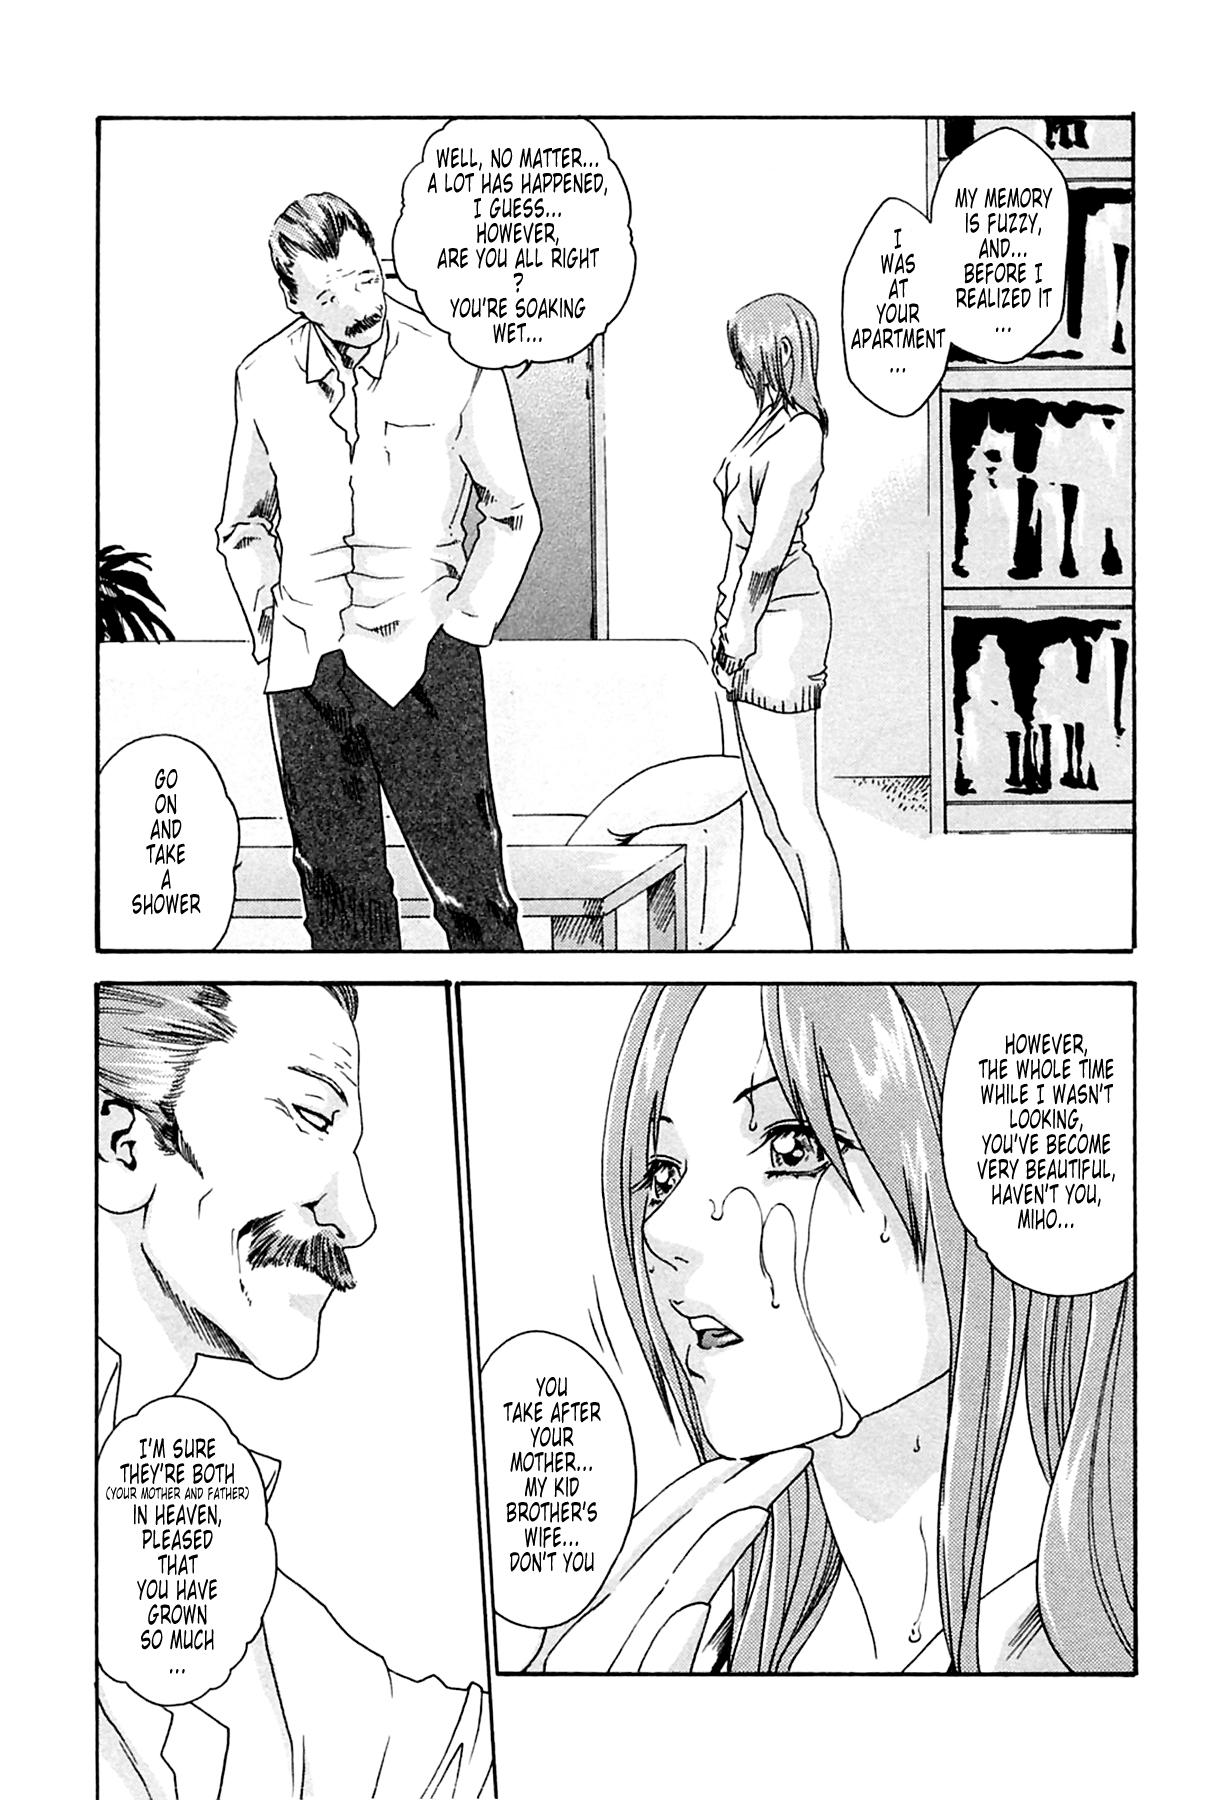 [Haruki] Kisei Juui Suzune (Parasite Doctor Suzune) Vol.02 - CH10-11 34